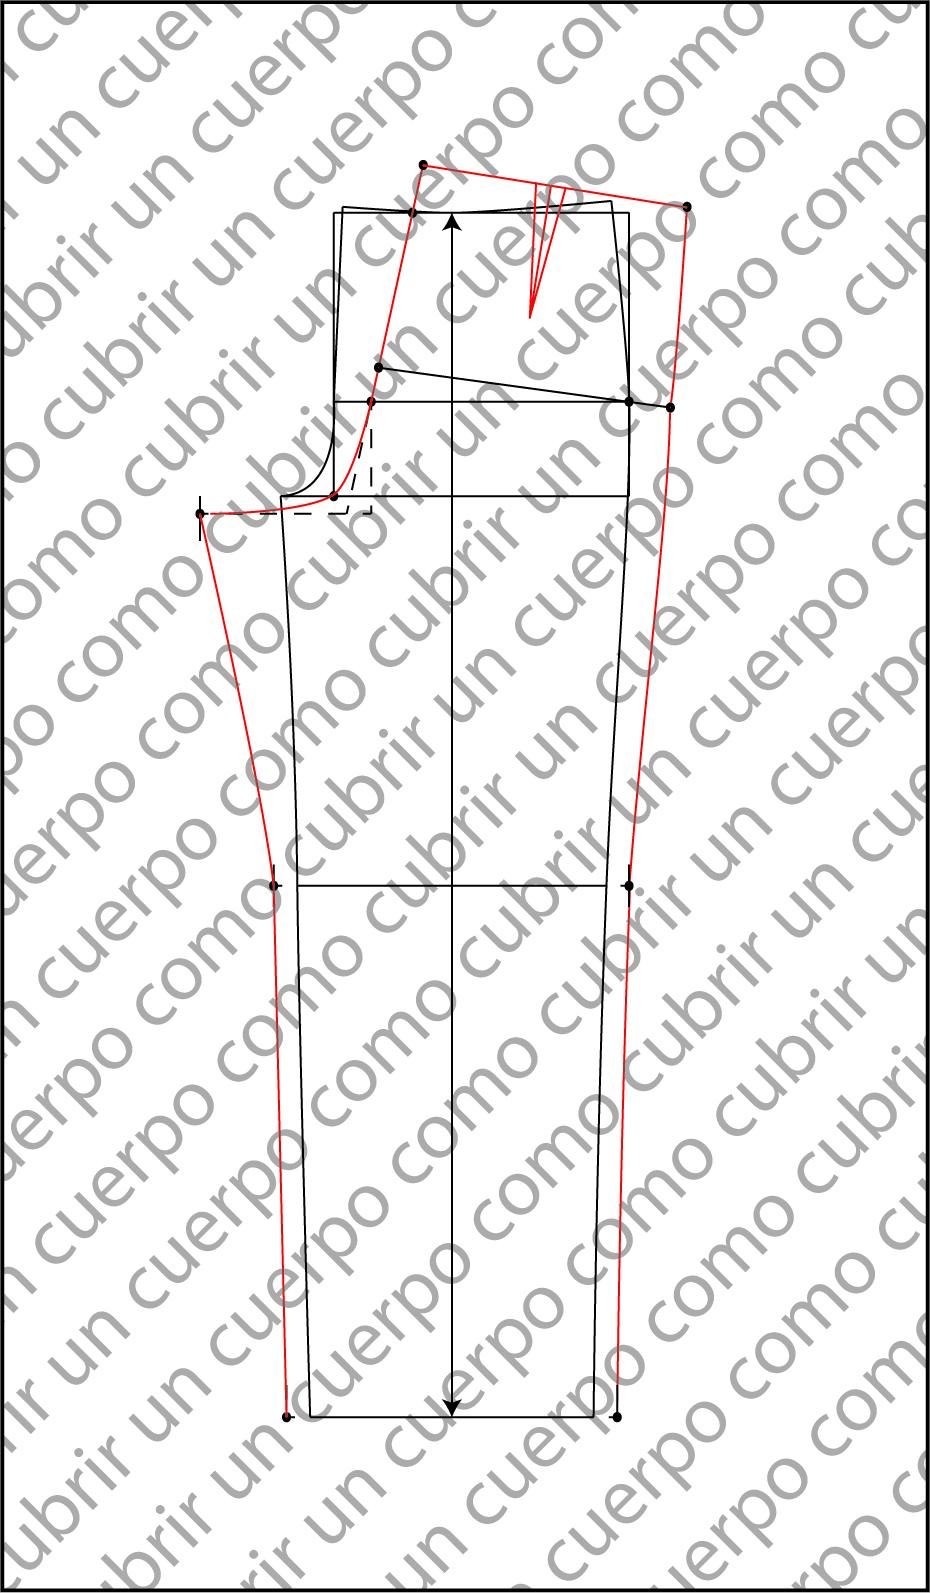 Patrón base del pantalón clásico de caballero conformación normal ...